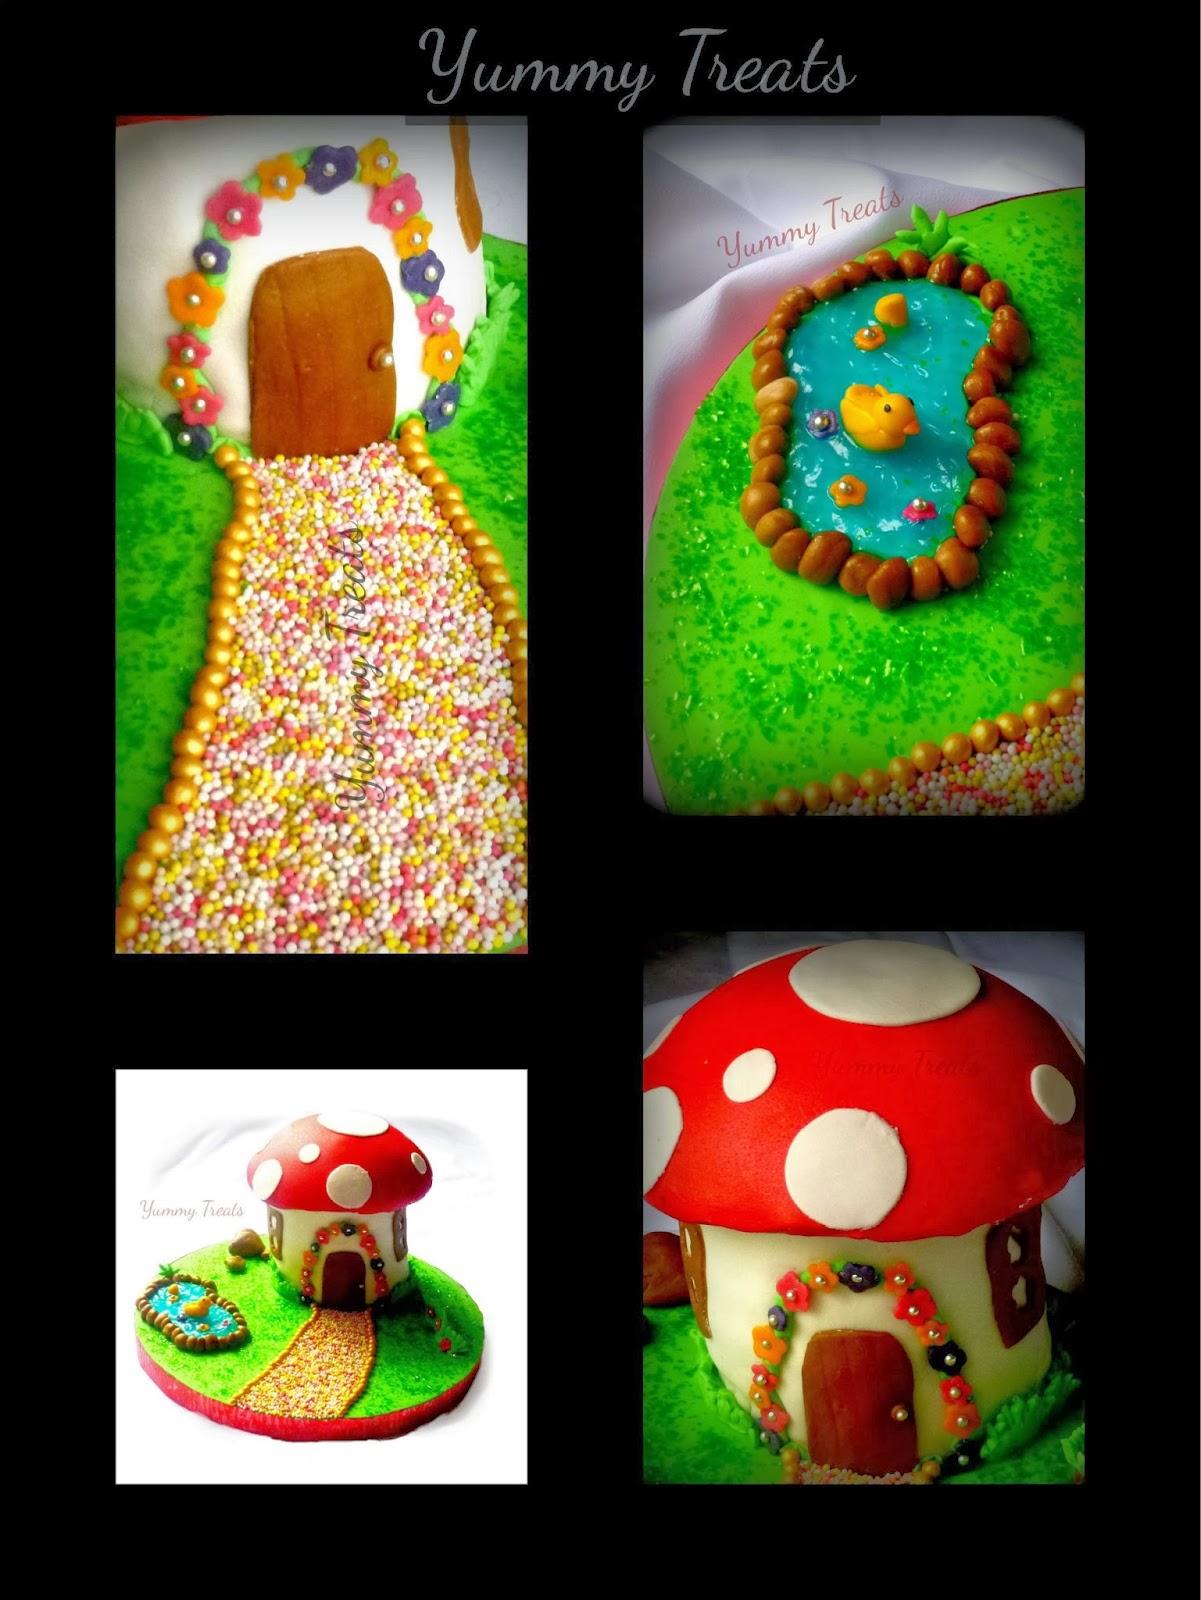 Yummy Treats Toadstool Mushroom Themed Birthday Cake